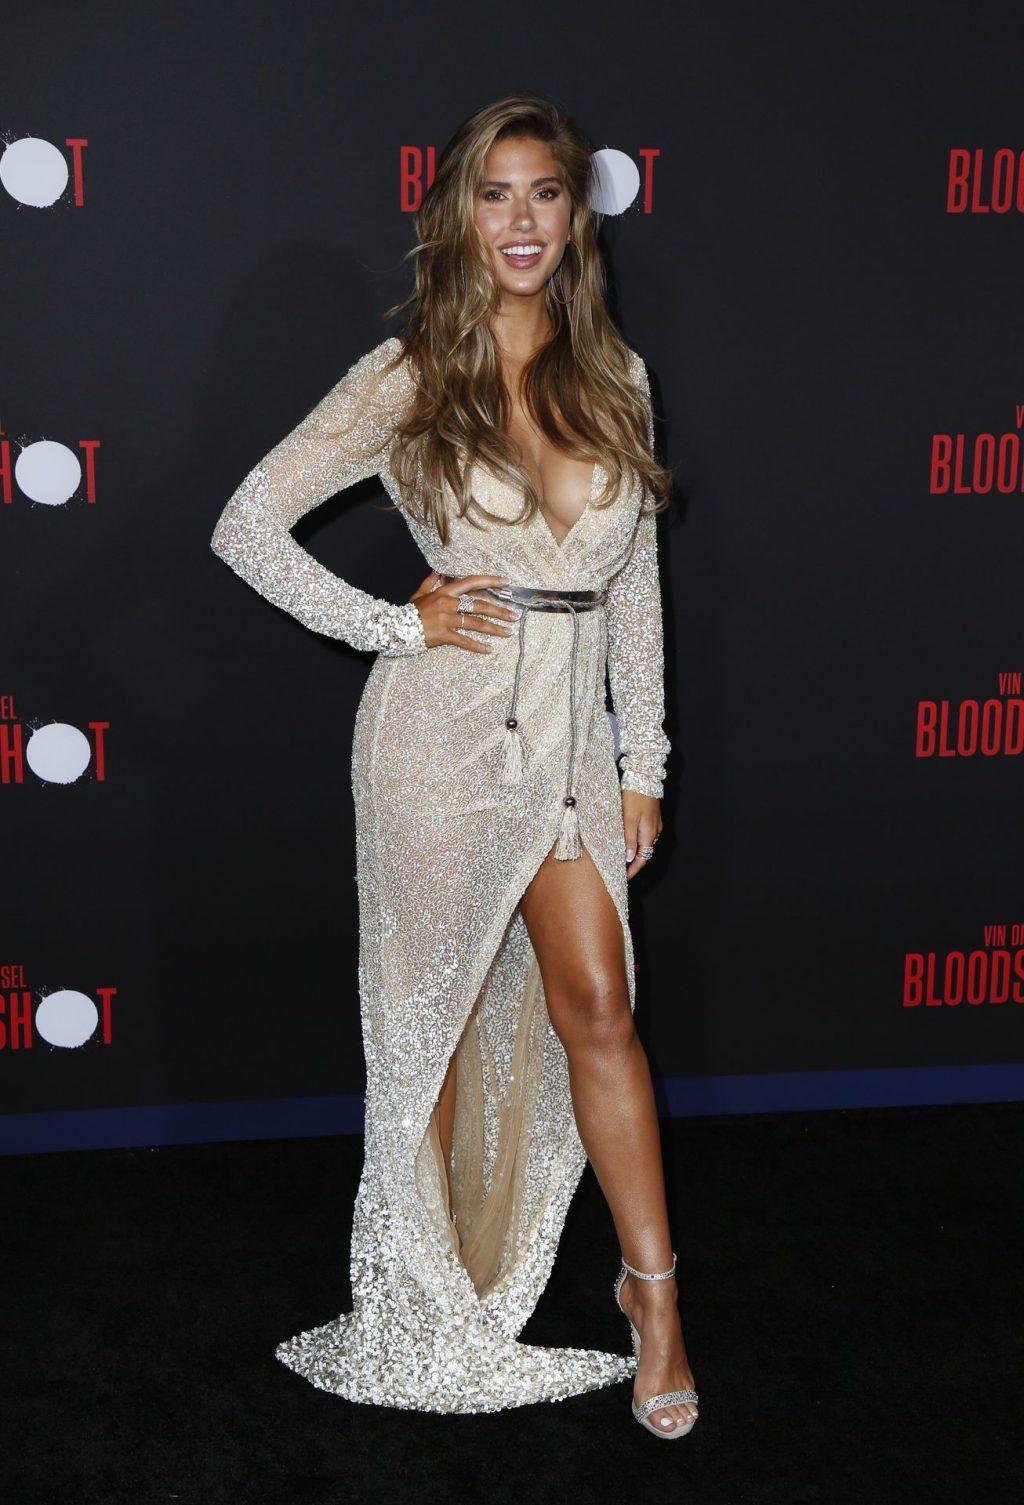 Kara Del Toro Displays Her Boobs at the Bloodshot Premiere in LA (26 Photos)